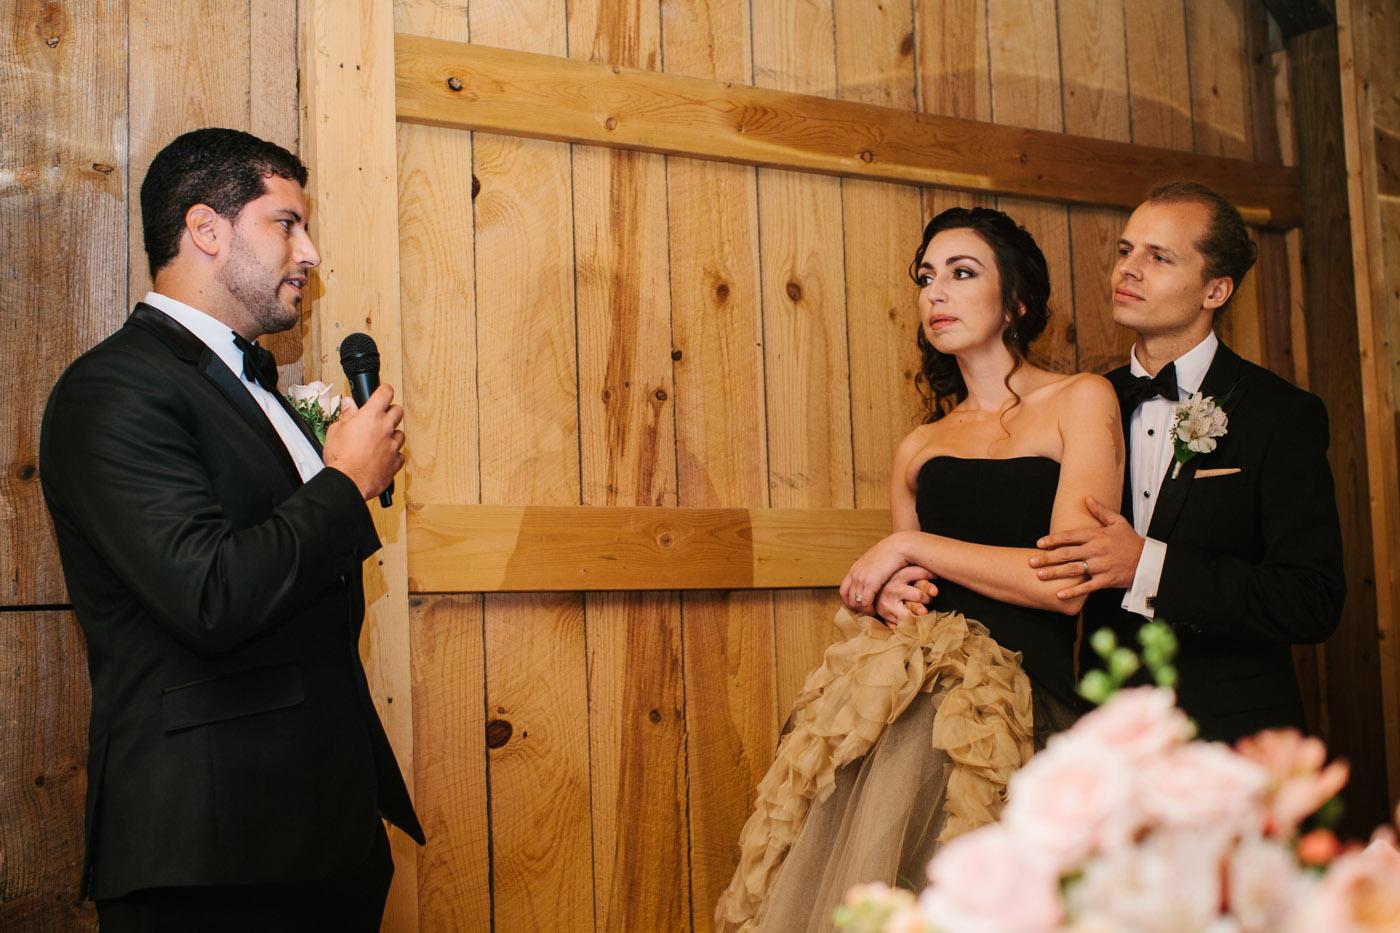 St-Louis-Wedding-Photography-1057.jpg